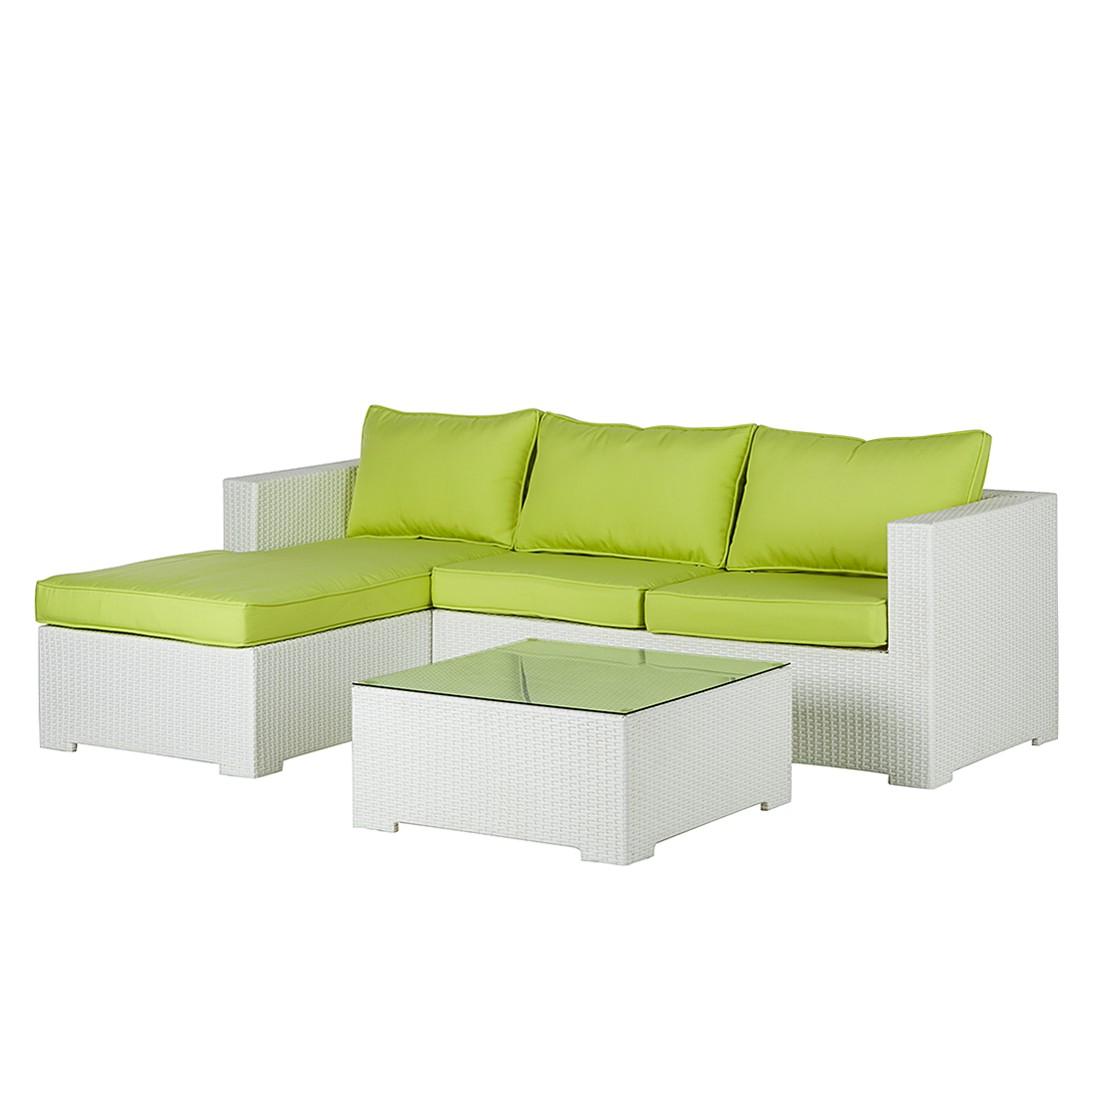 Home 24 - Salon de jardin white comfort (3 éléments) - poly rotin / textile - blanc / kiwi, fredriks